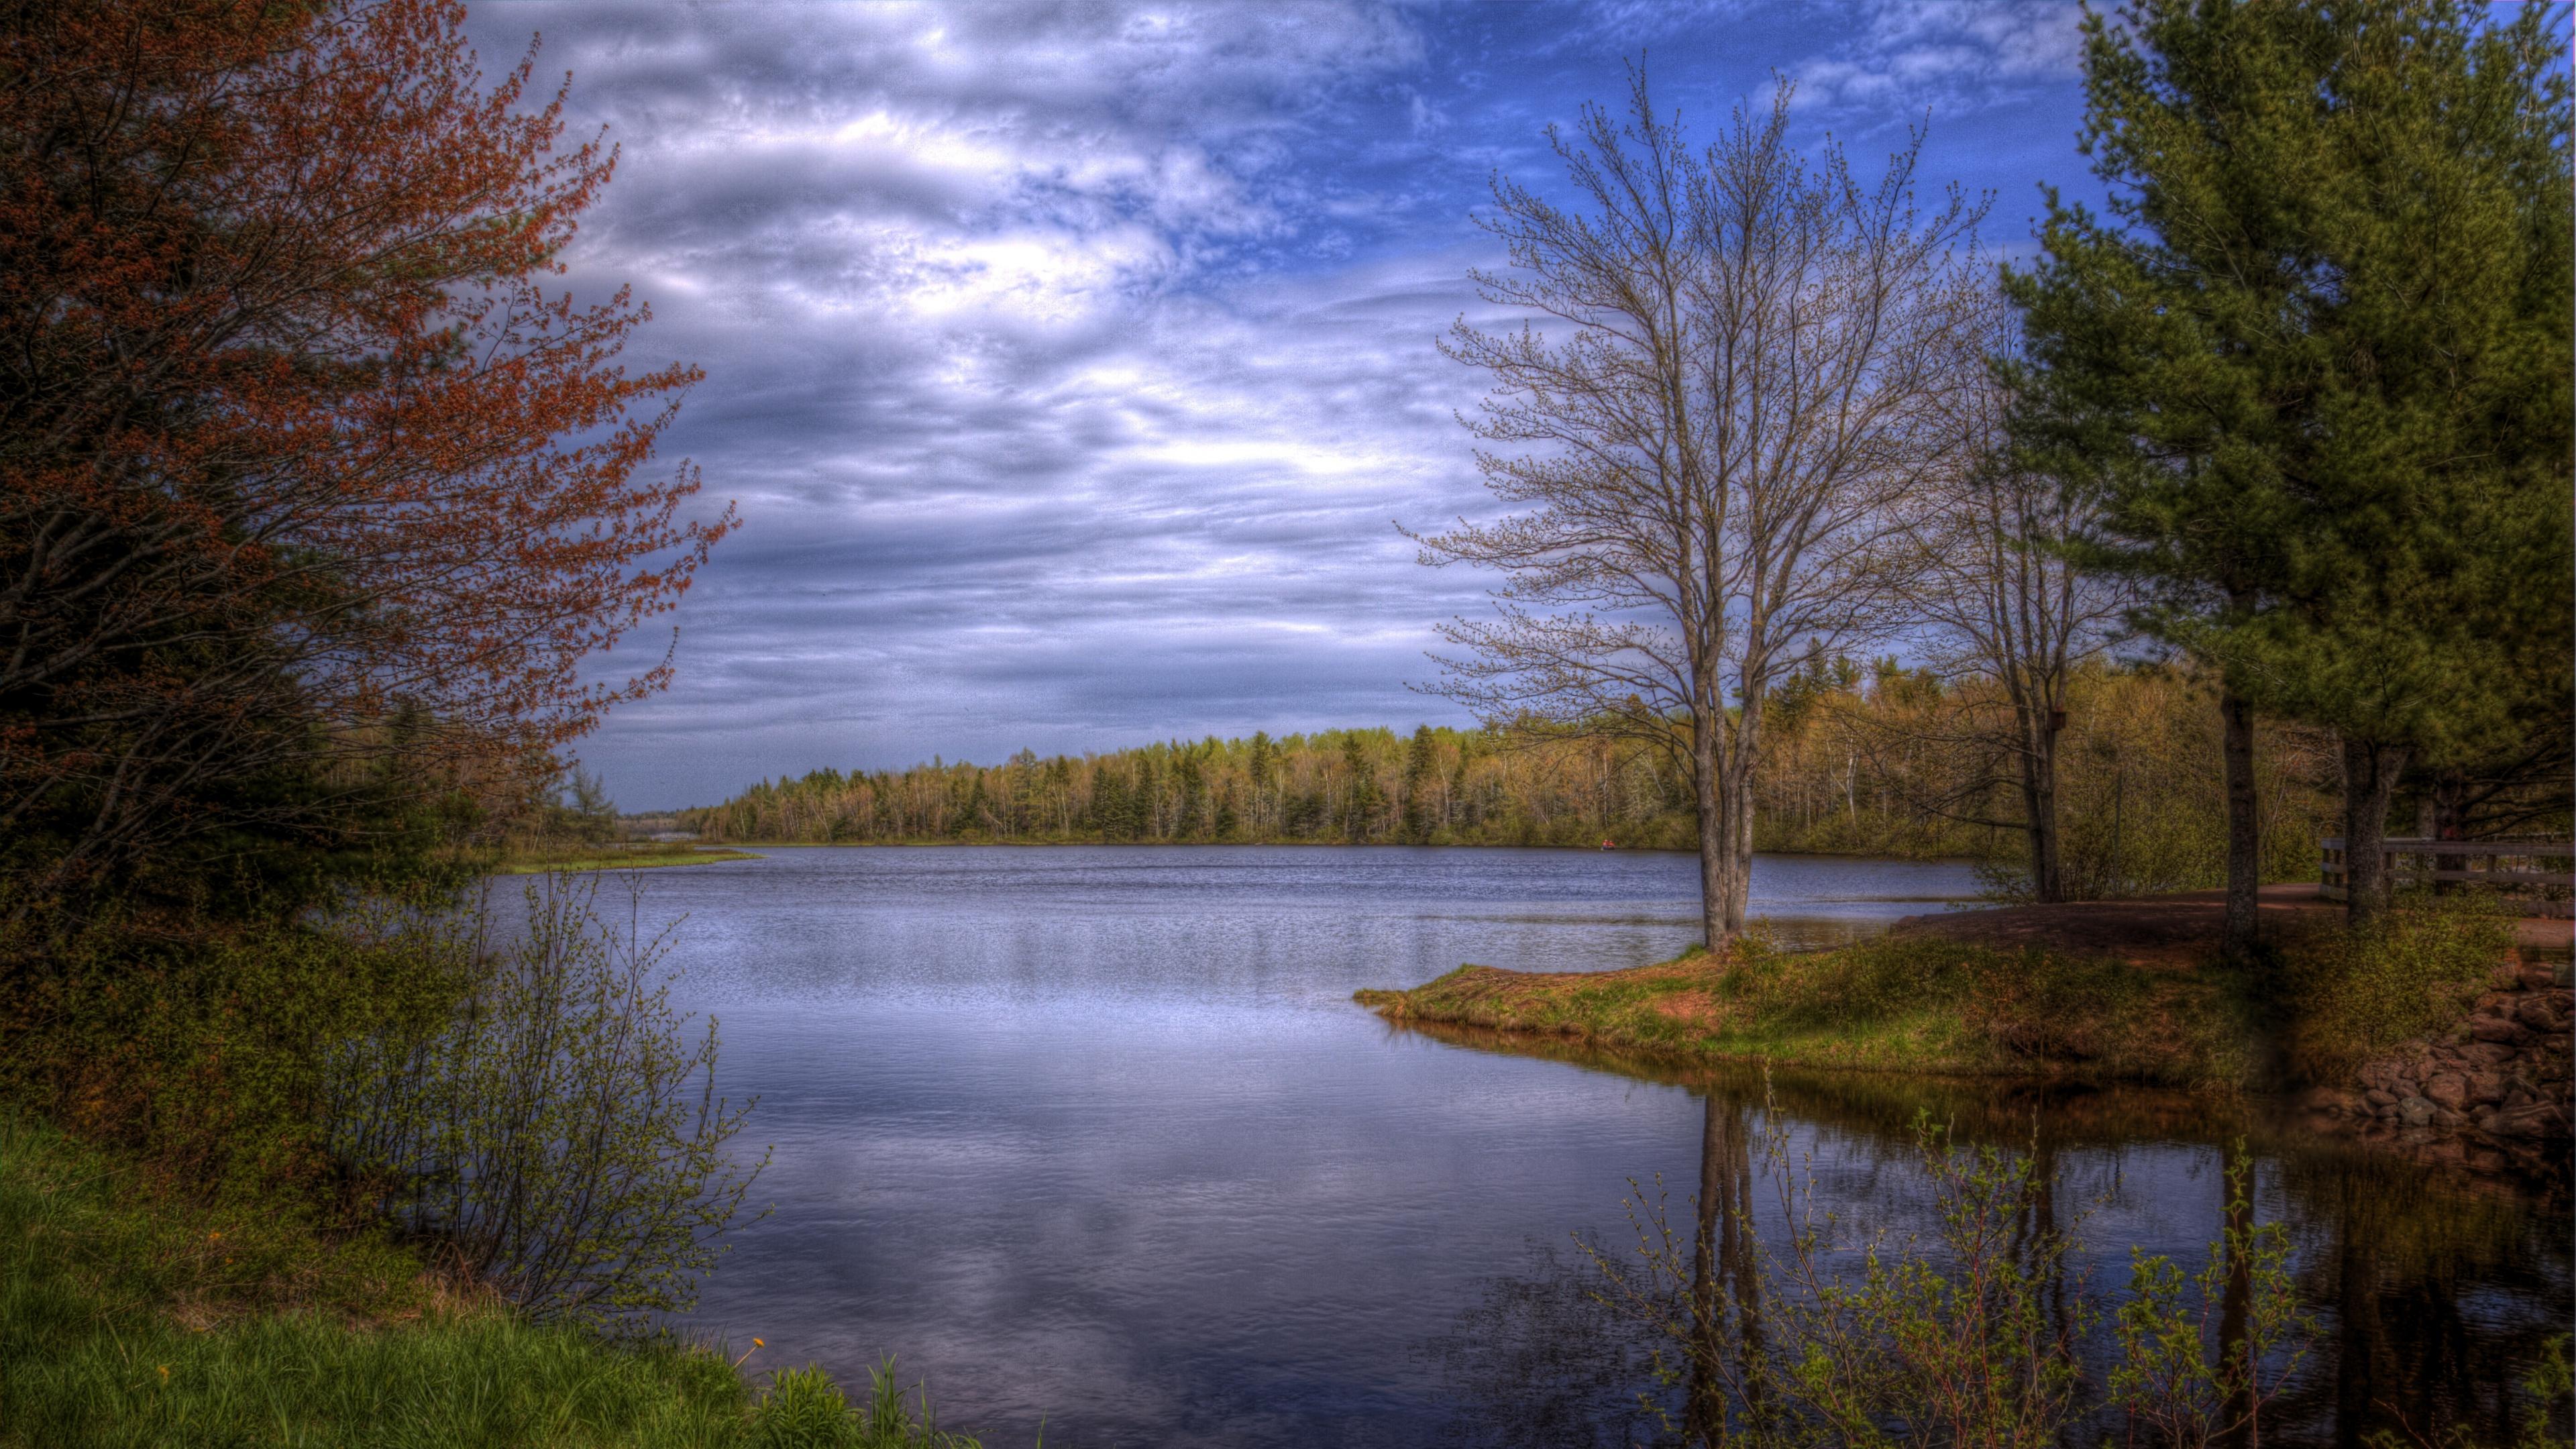 Wallpaper 38402160 lake trees sky landscape hdr 4K Ultra HD HD 3840x2160